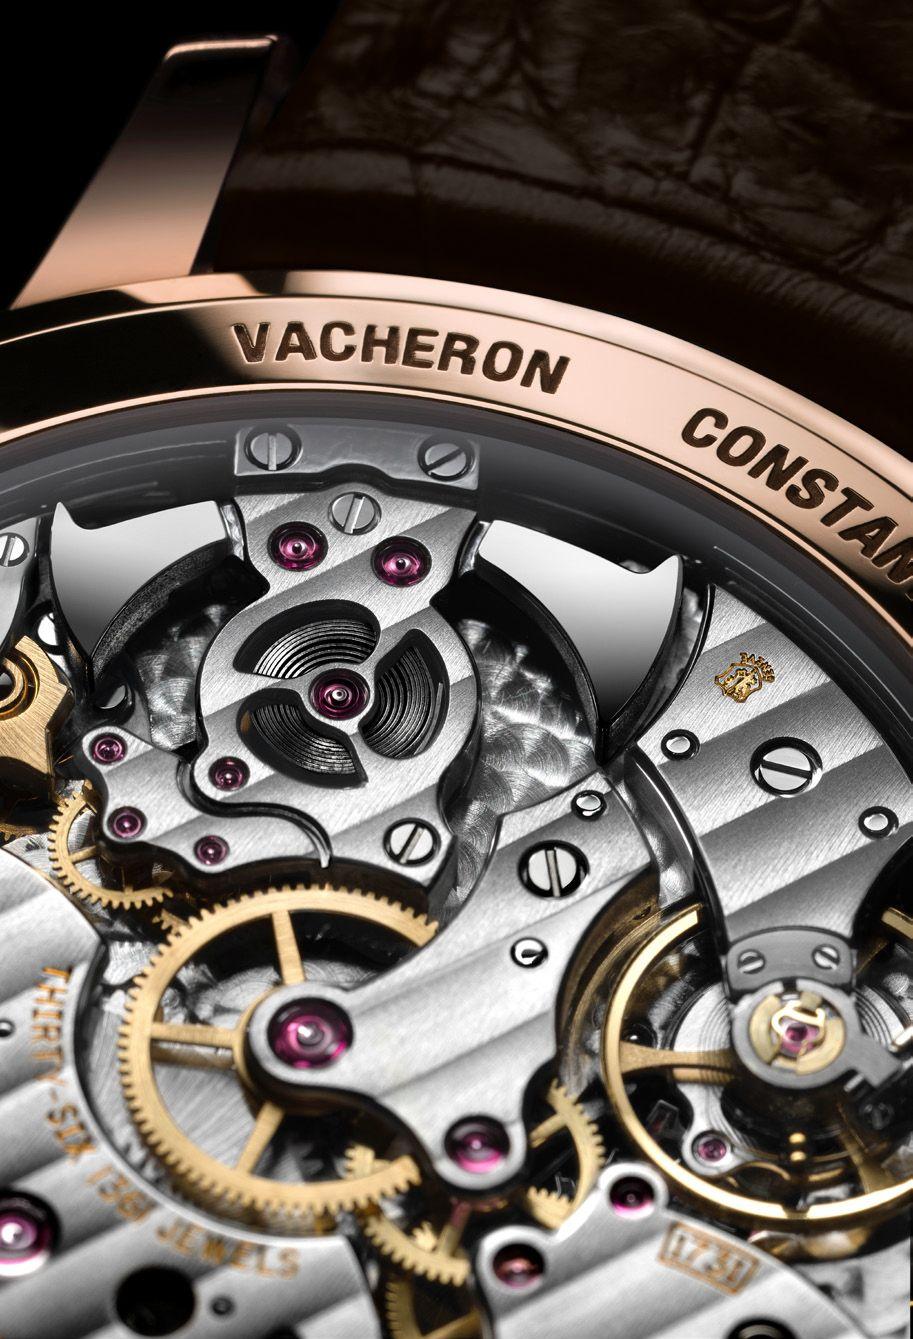 Vacheron Constantin Les Cabinotiers Minute Repeater Ultra-Thin, Vacheron Constantin Minute Repeater Ultra Thin, Vacheron Constantin 6630C/000R-B664, 6630C/000R-B664